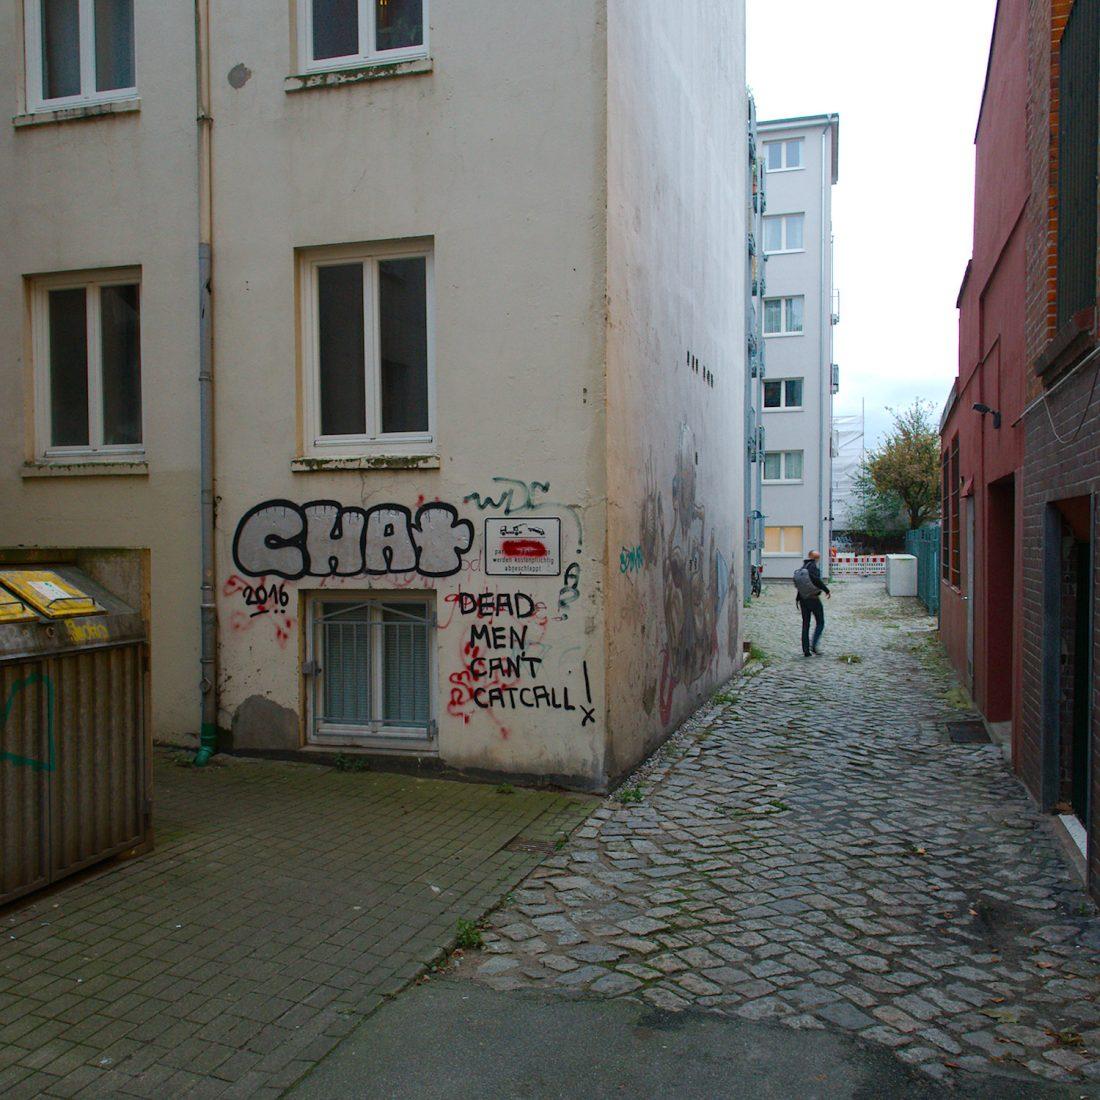 Dead Men can't catcall: Graffiti in Hamburgs's Lagerhausstrasse, Karoviertel